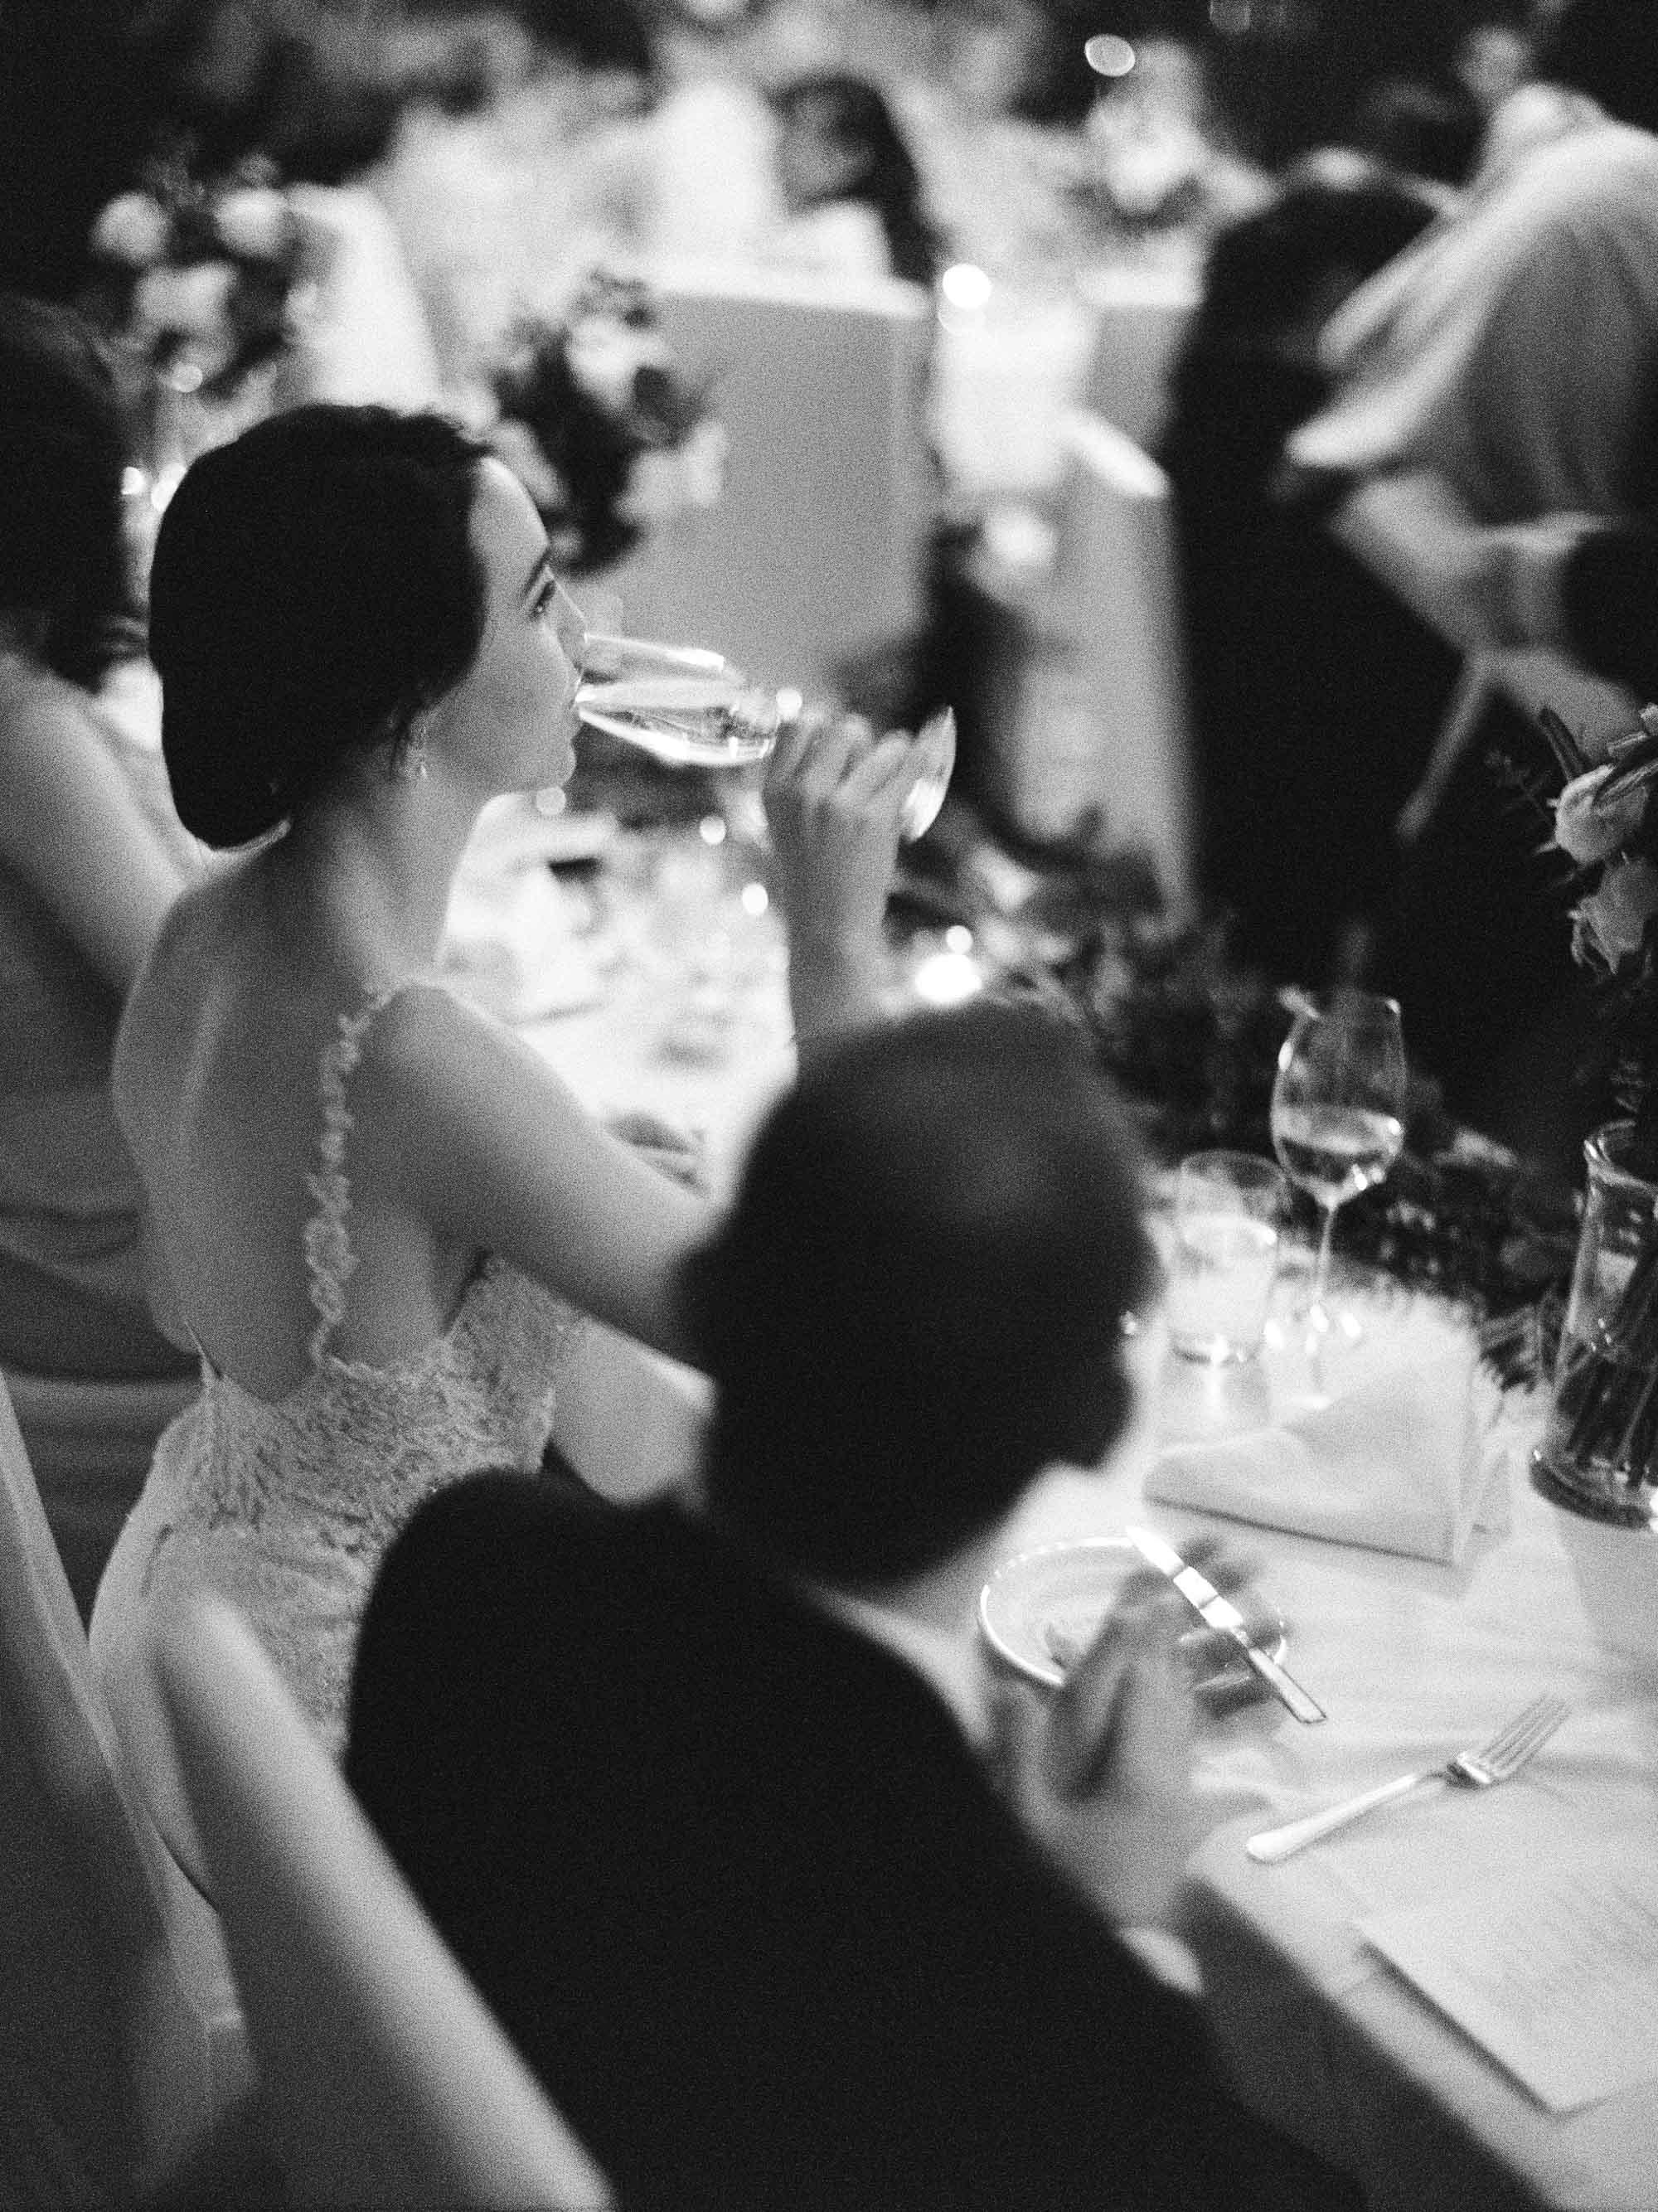 Mount-Lofty-House-wedding-photography-095.jpg